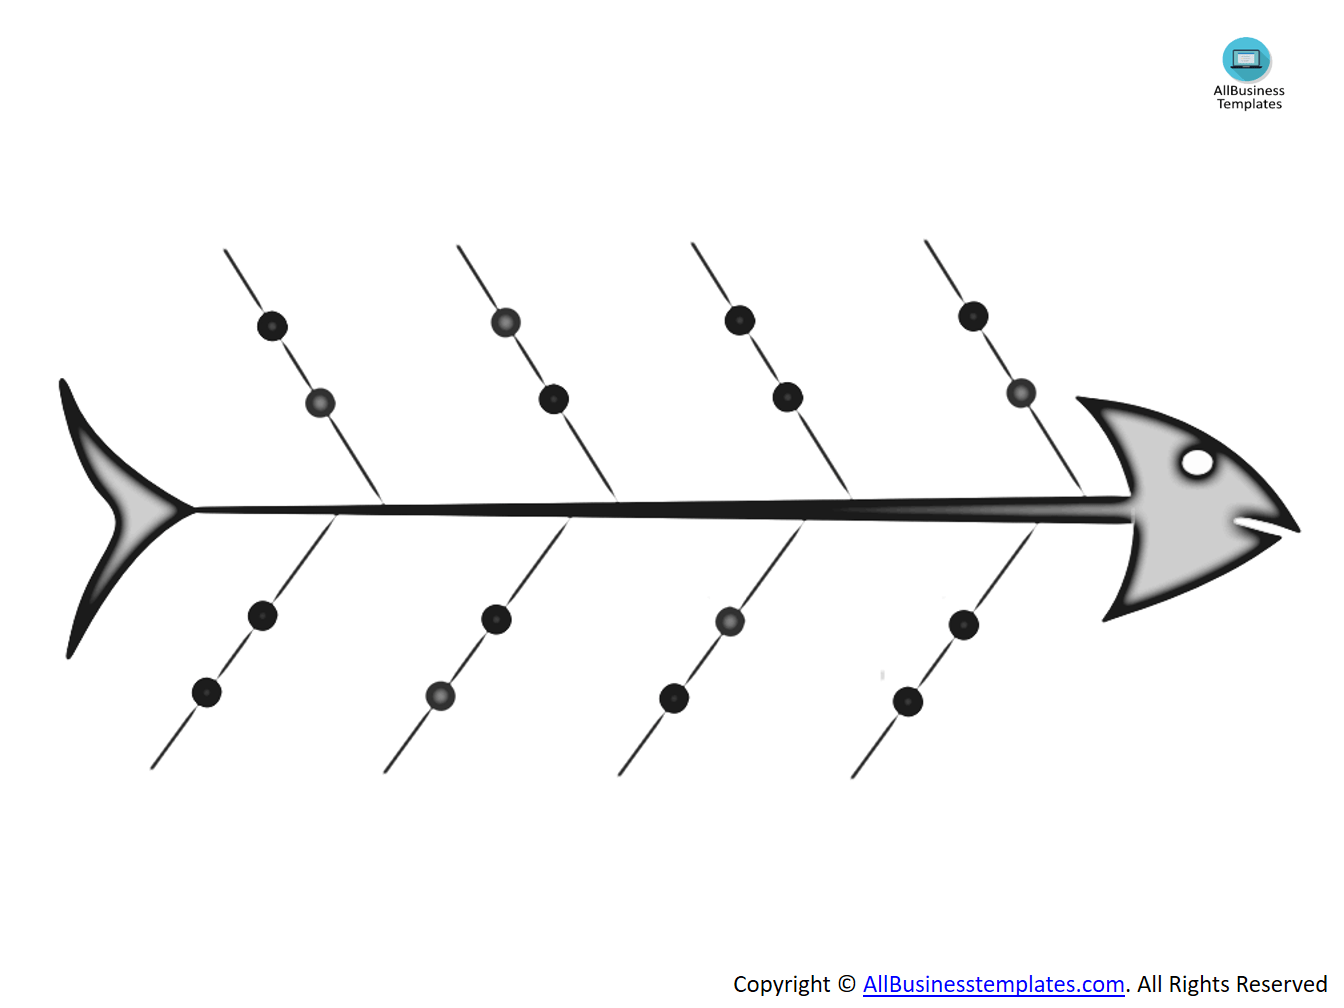 6m fishbone diagram projects